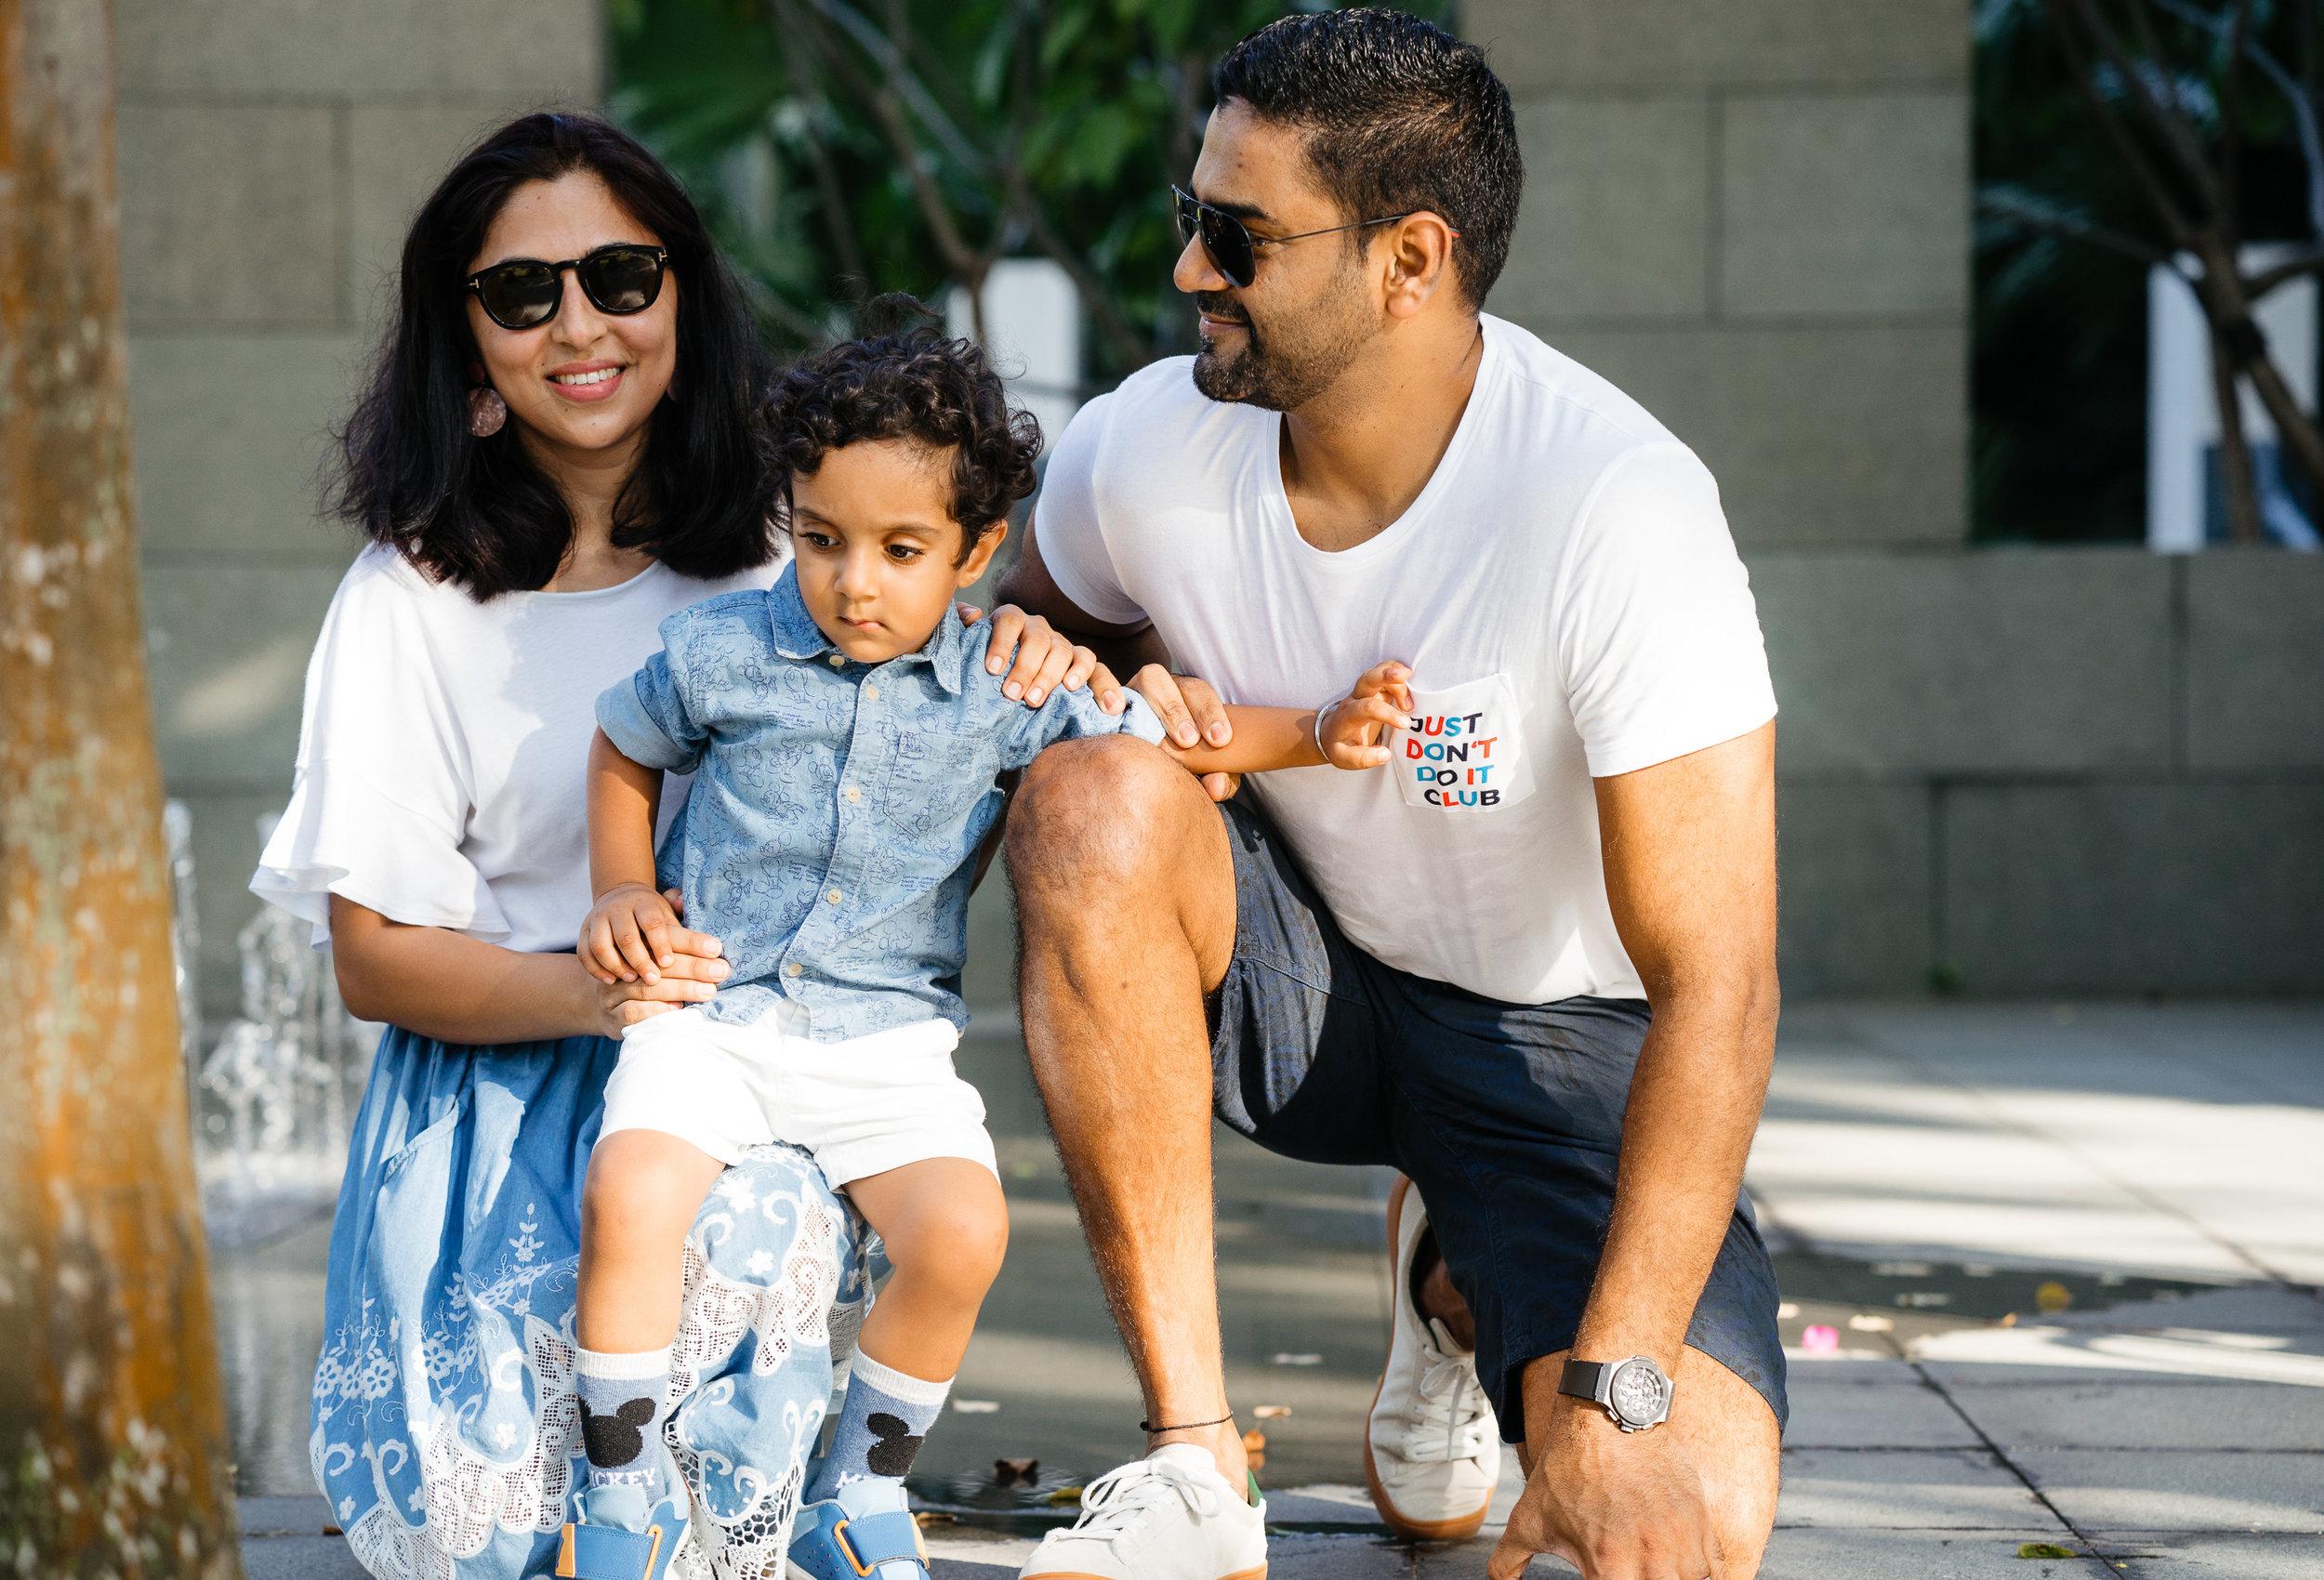 golden-hour-family-photoshoot-singapore-expat-family-5